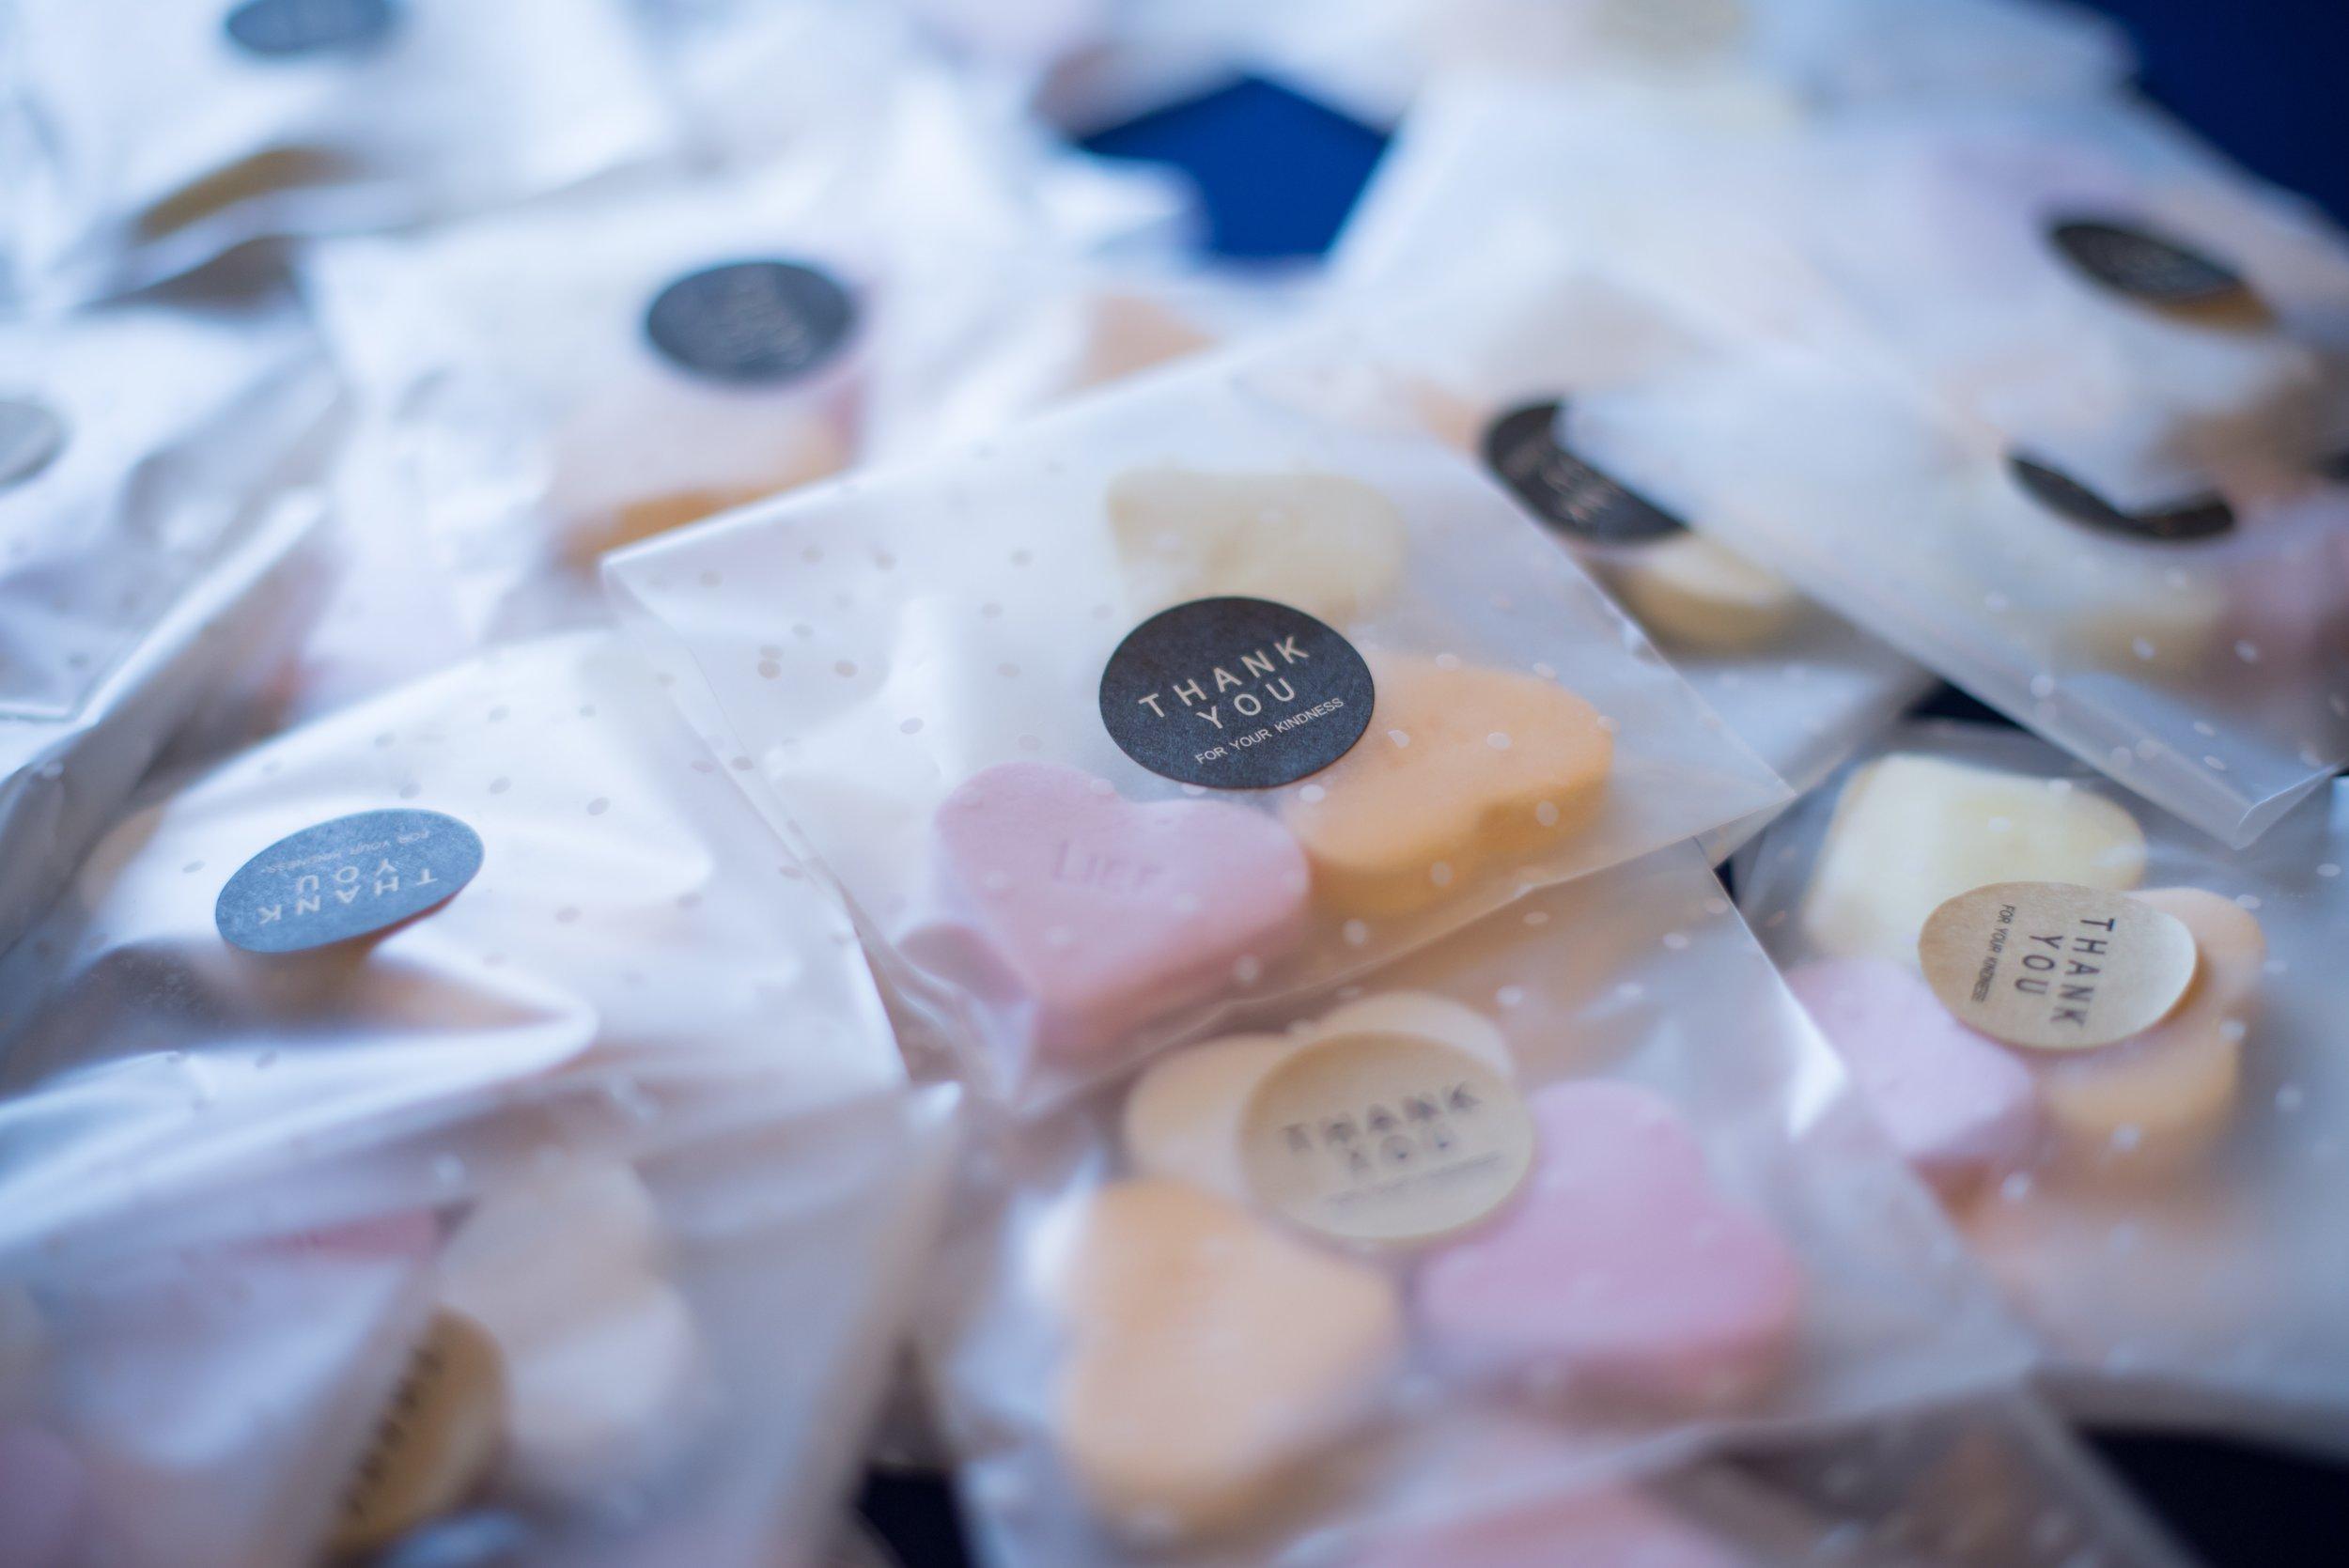 blur-candy-care-330990.jpg